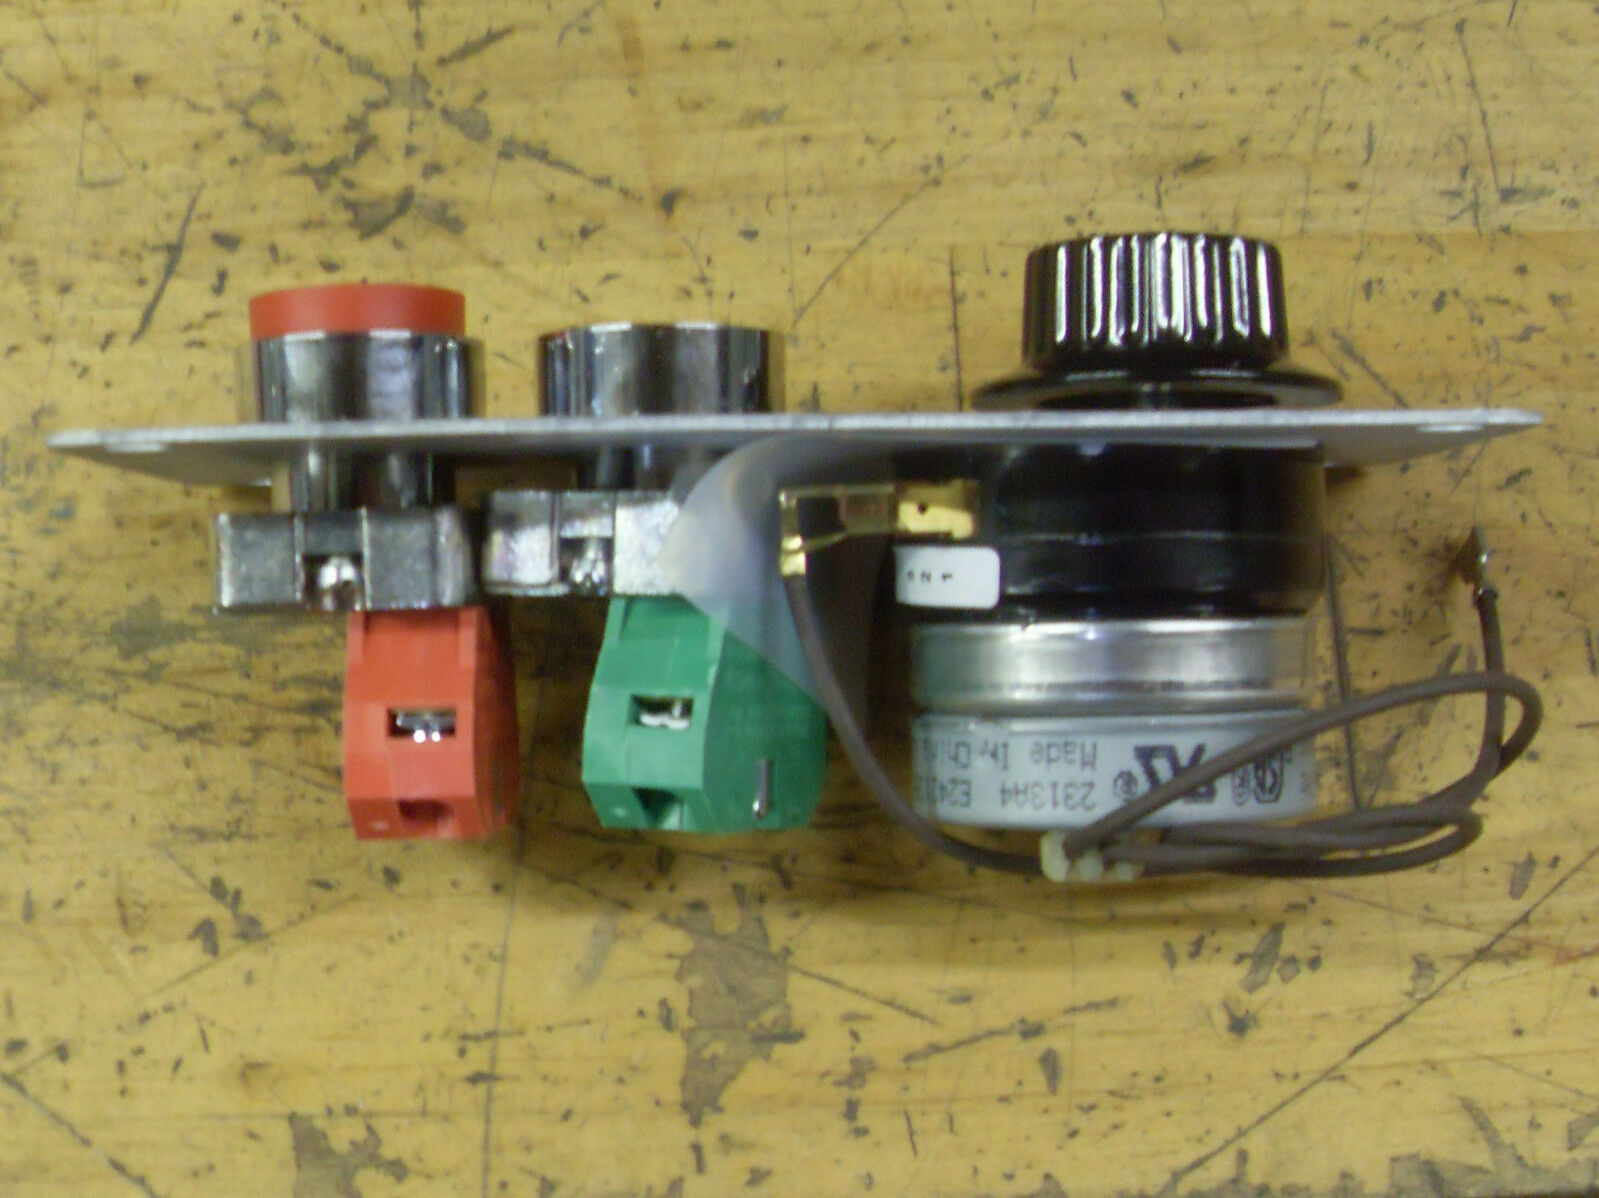 Hobart Mixer Start Stop With 15 min 220 Volt Timer Kit H-600 60qt & on